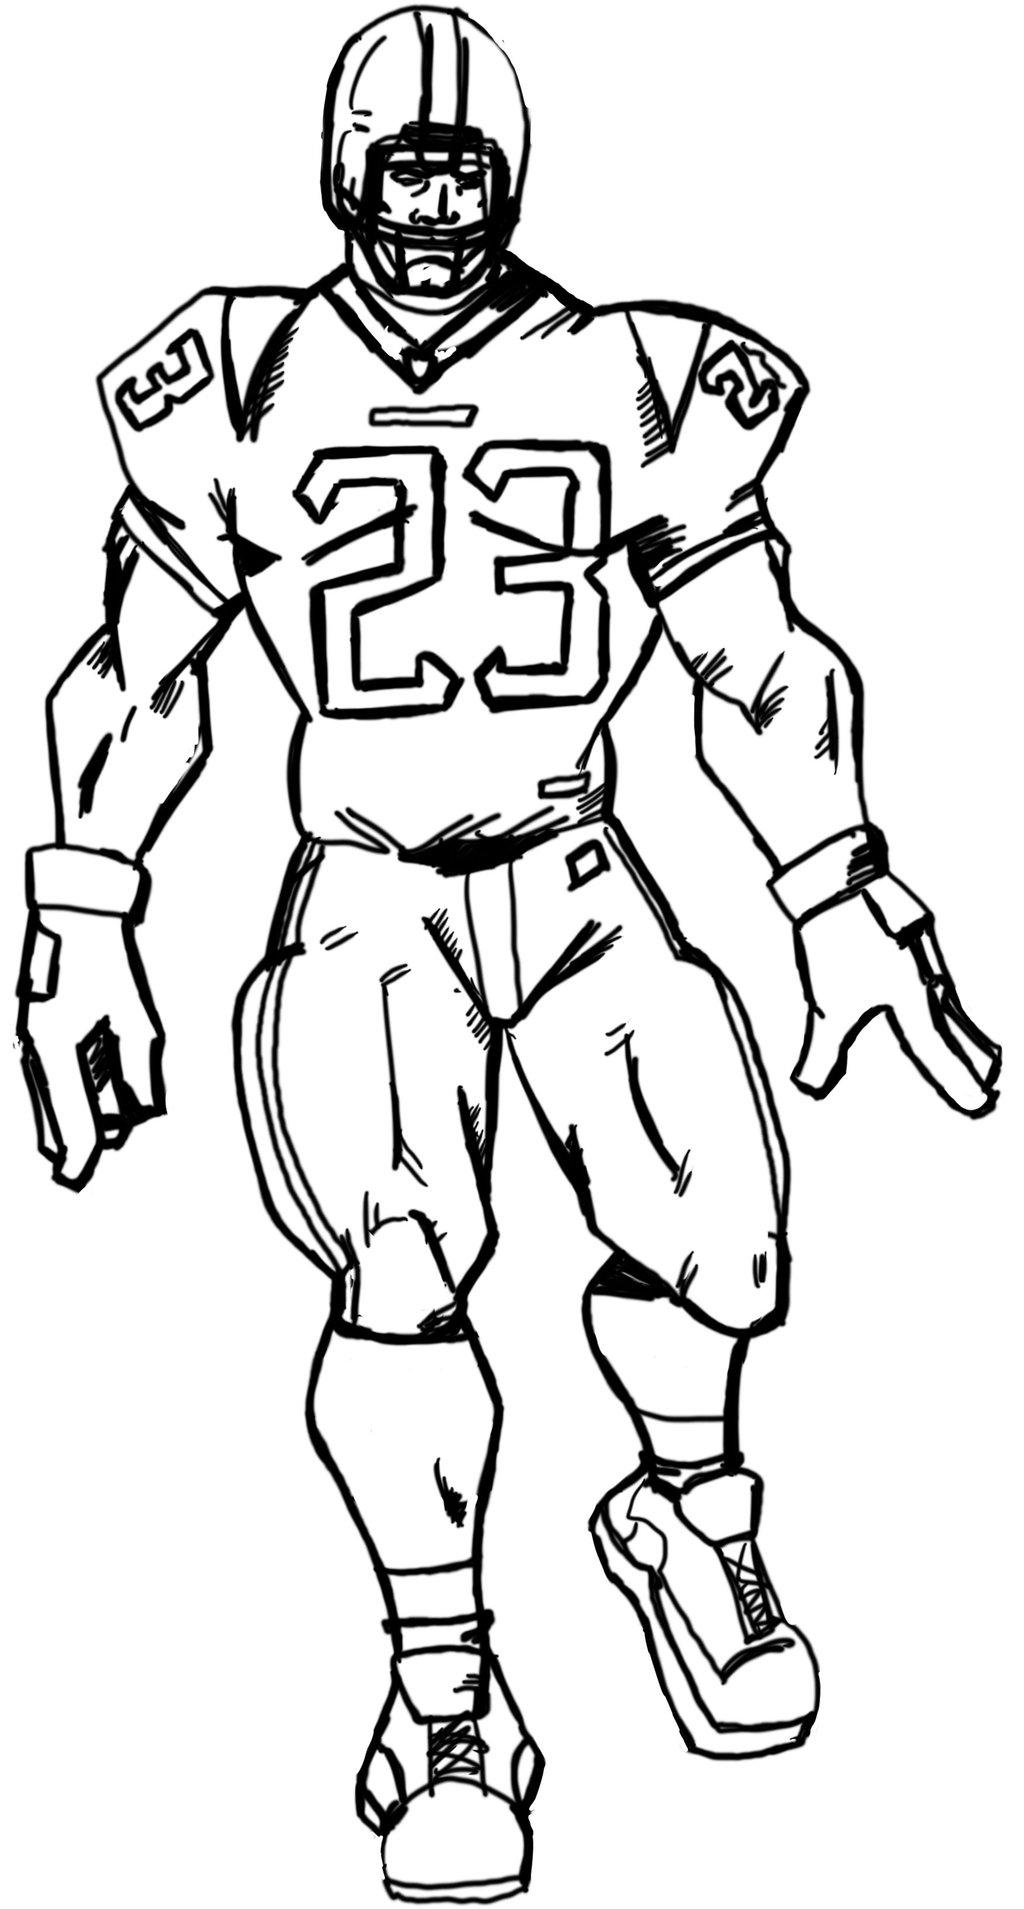 Football Players Drawings